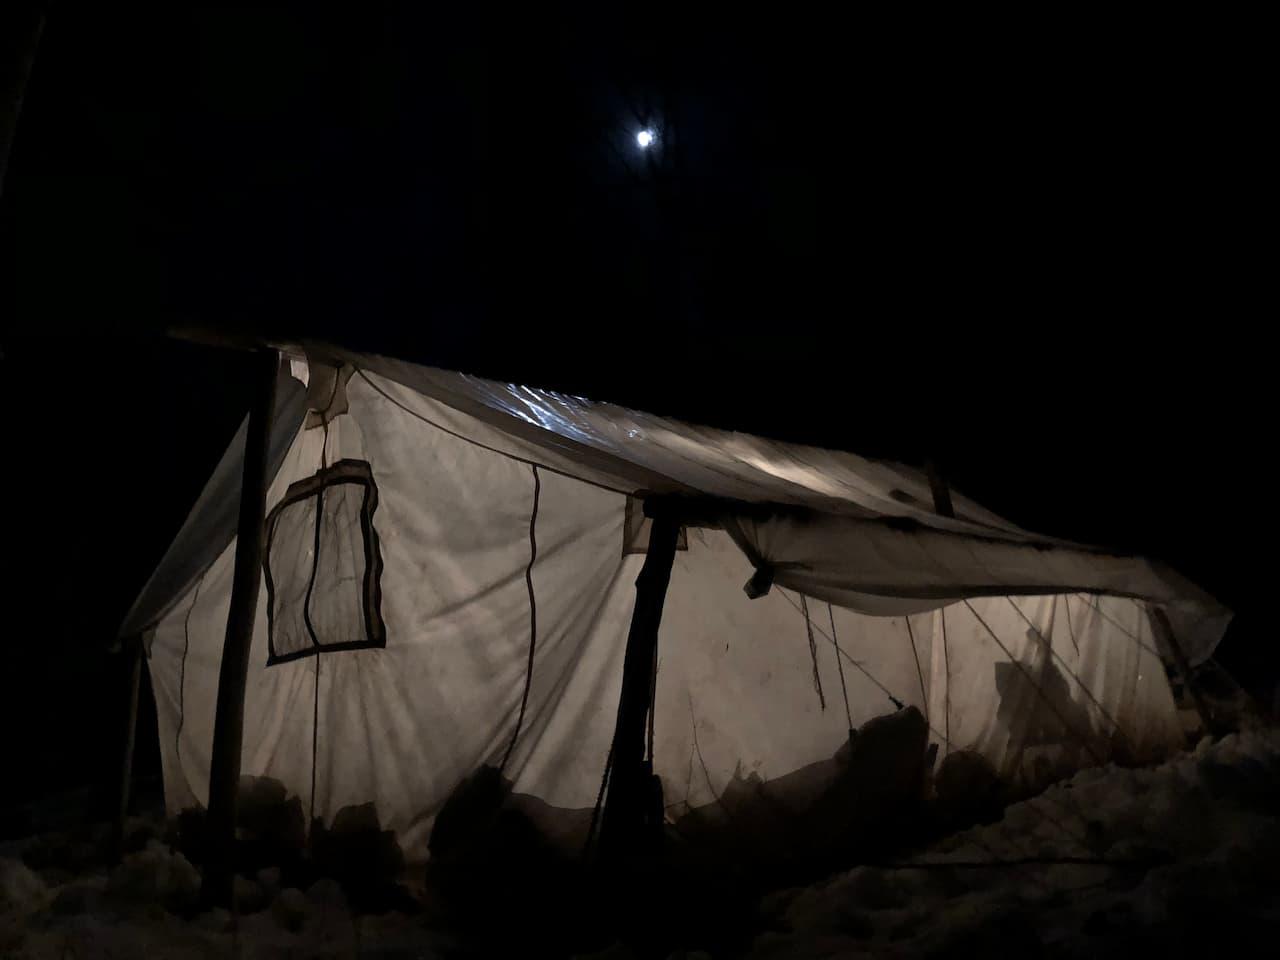 Summer Camp at night near Meeker Colorado